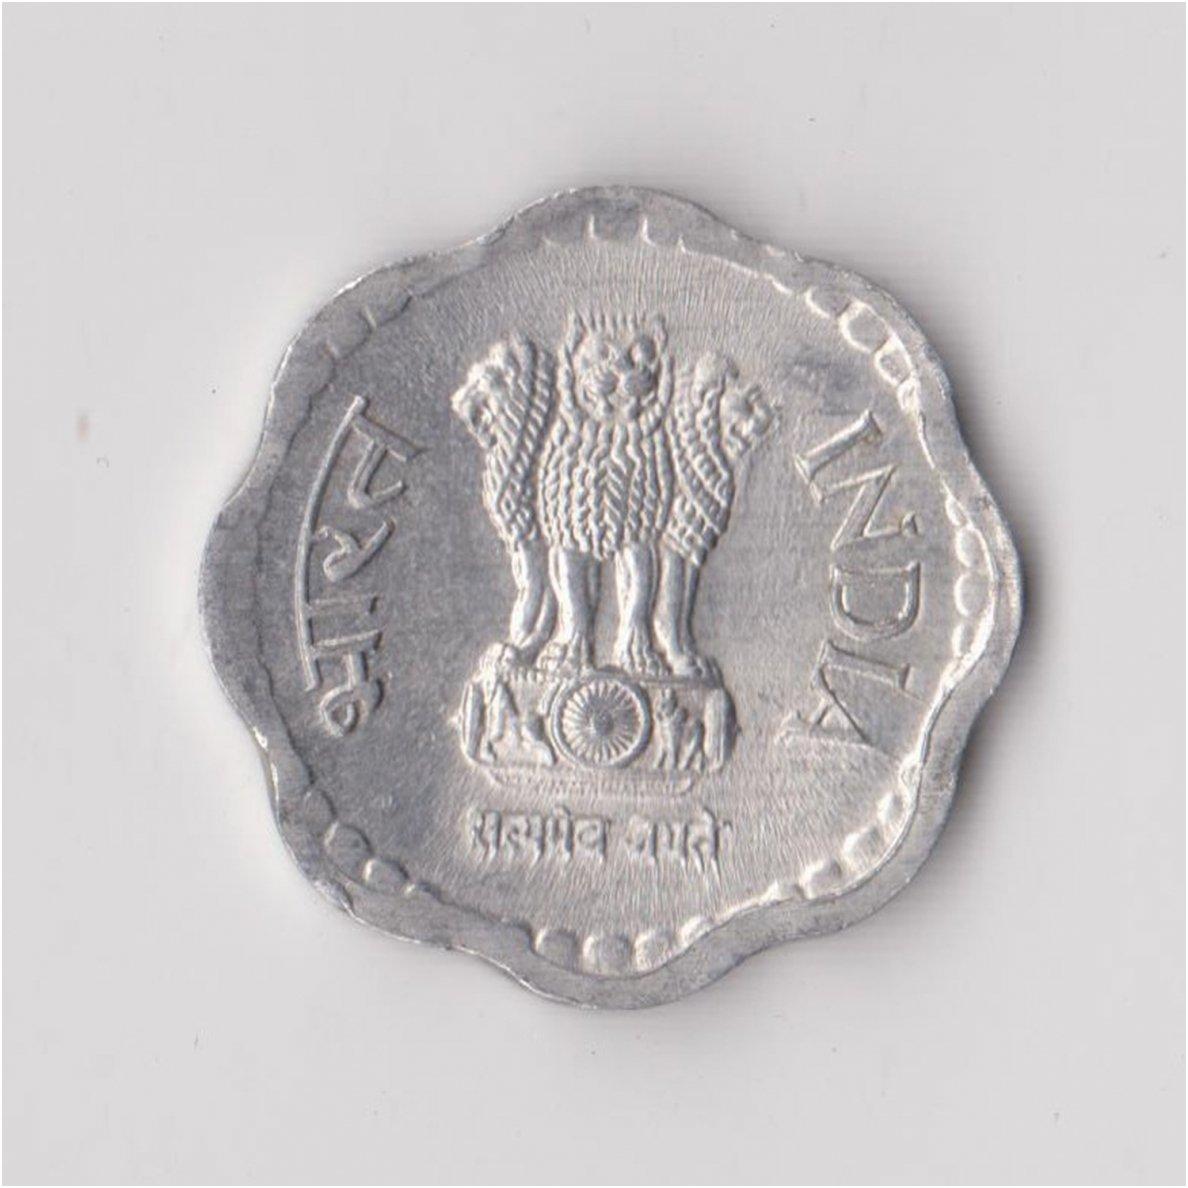 10 paise coin 1986